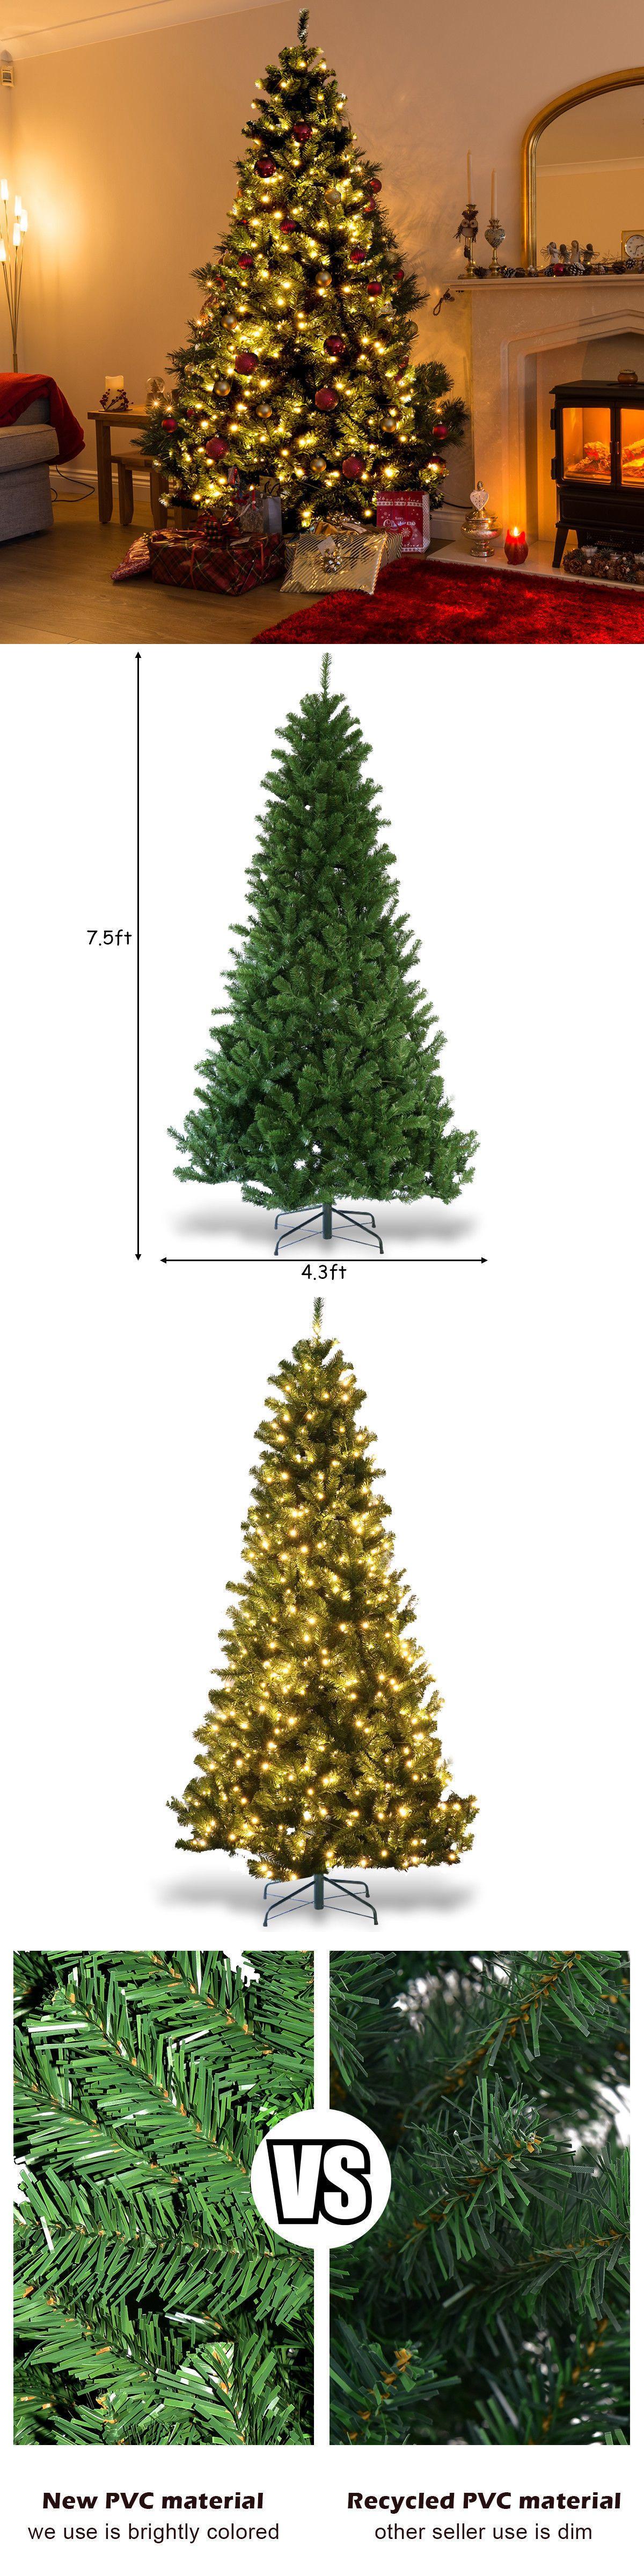 Artificial Christmas Trees 117414: 7.5Ft Pre-Lit Pvc Dense ...